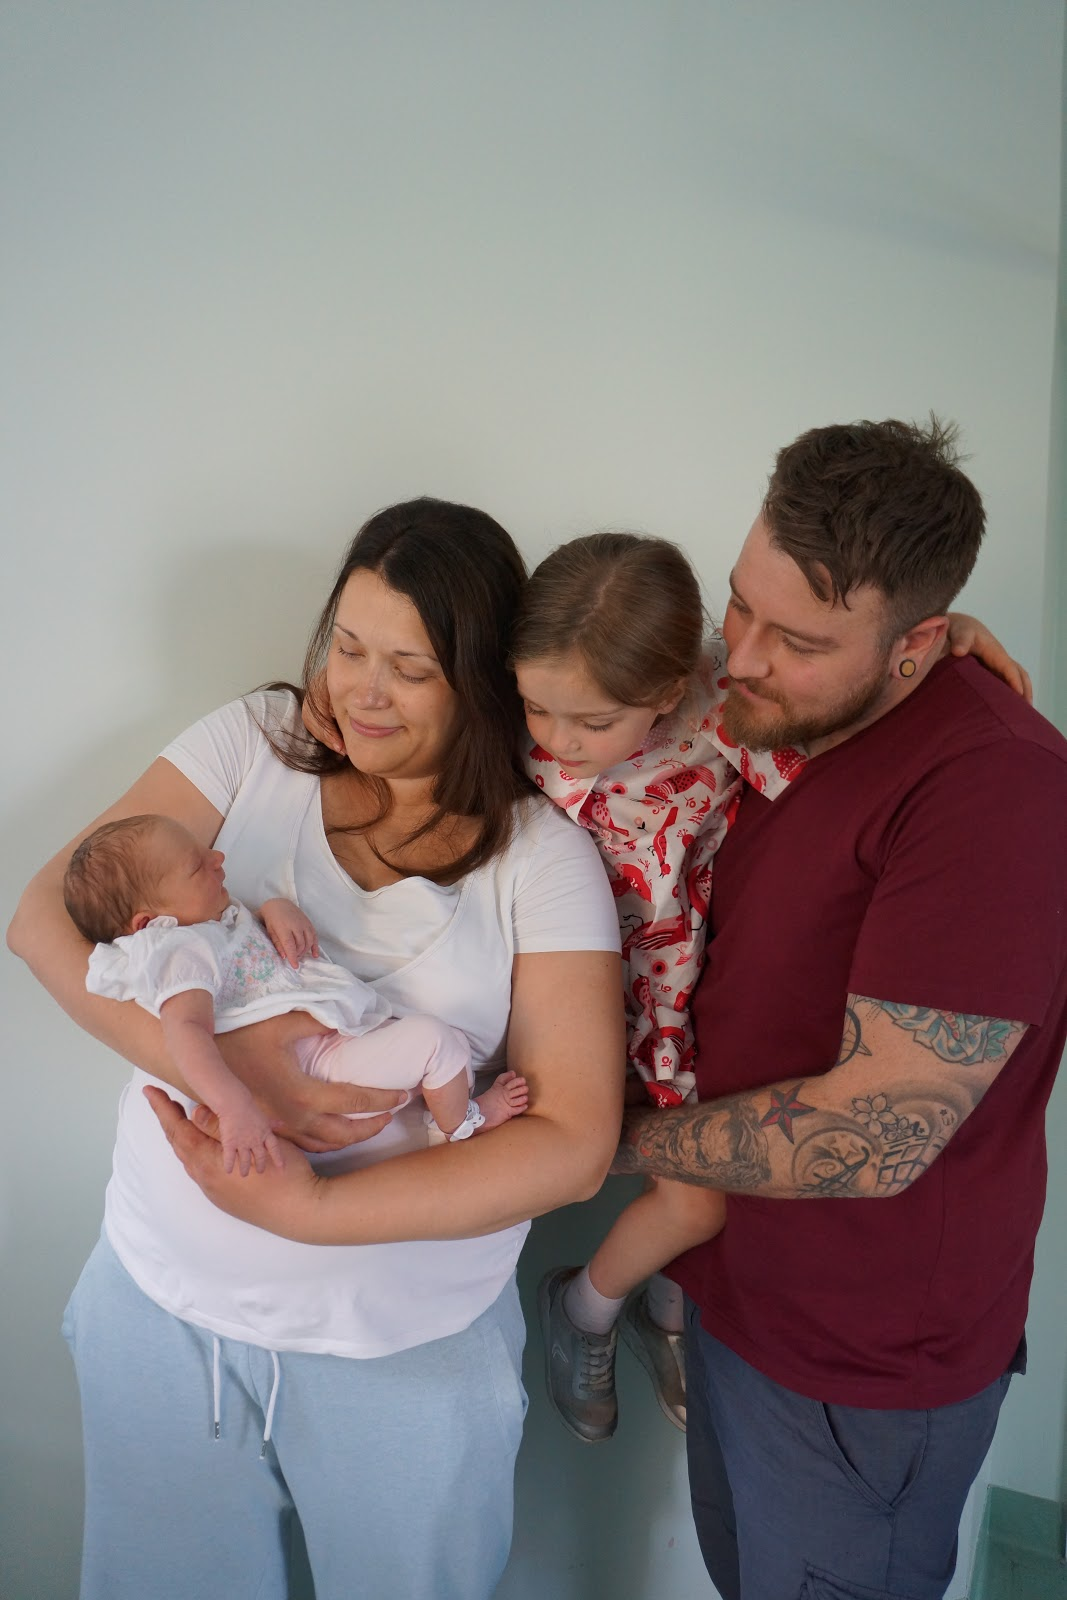 mum, dad and sister looking at a newborn